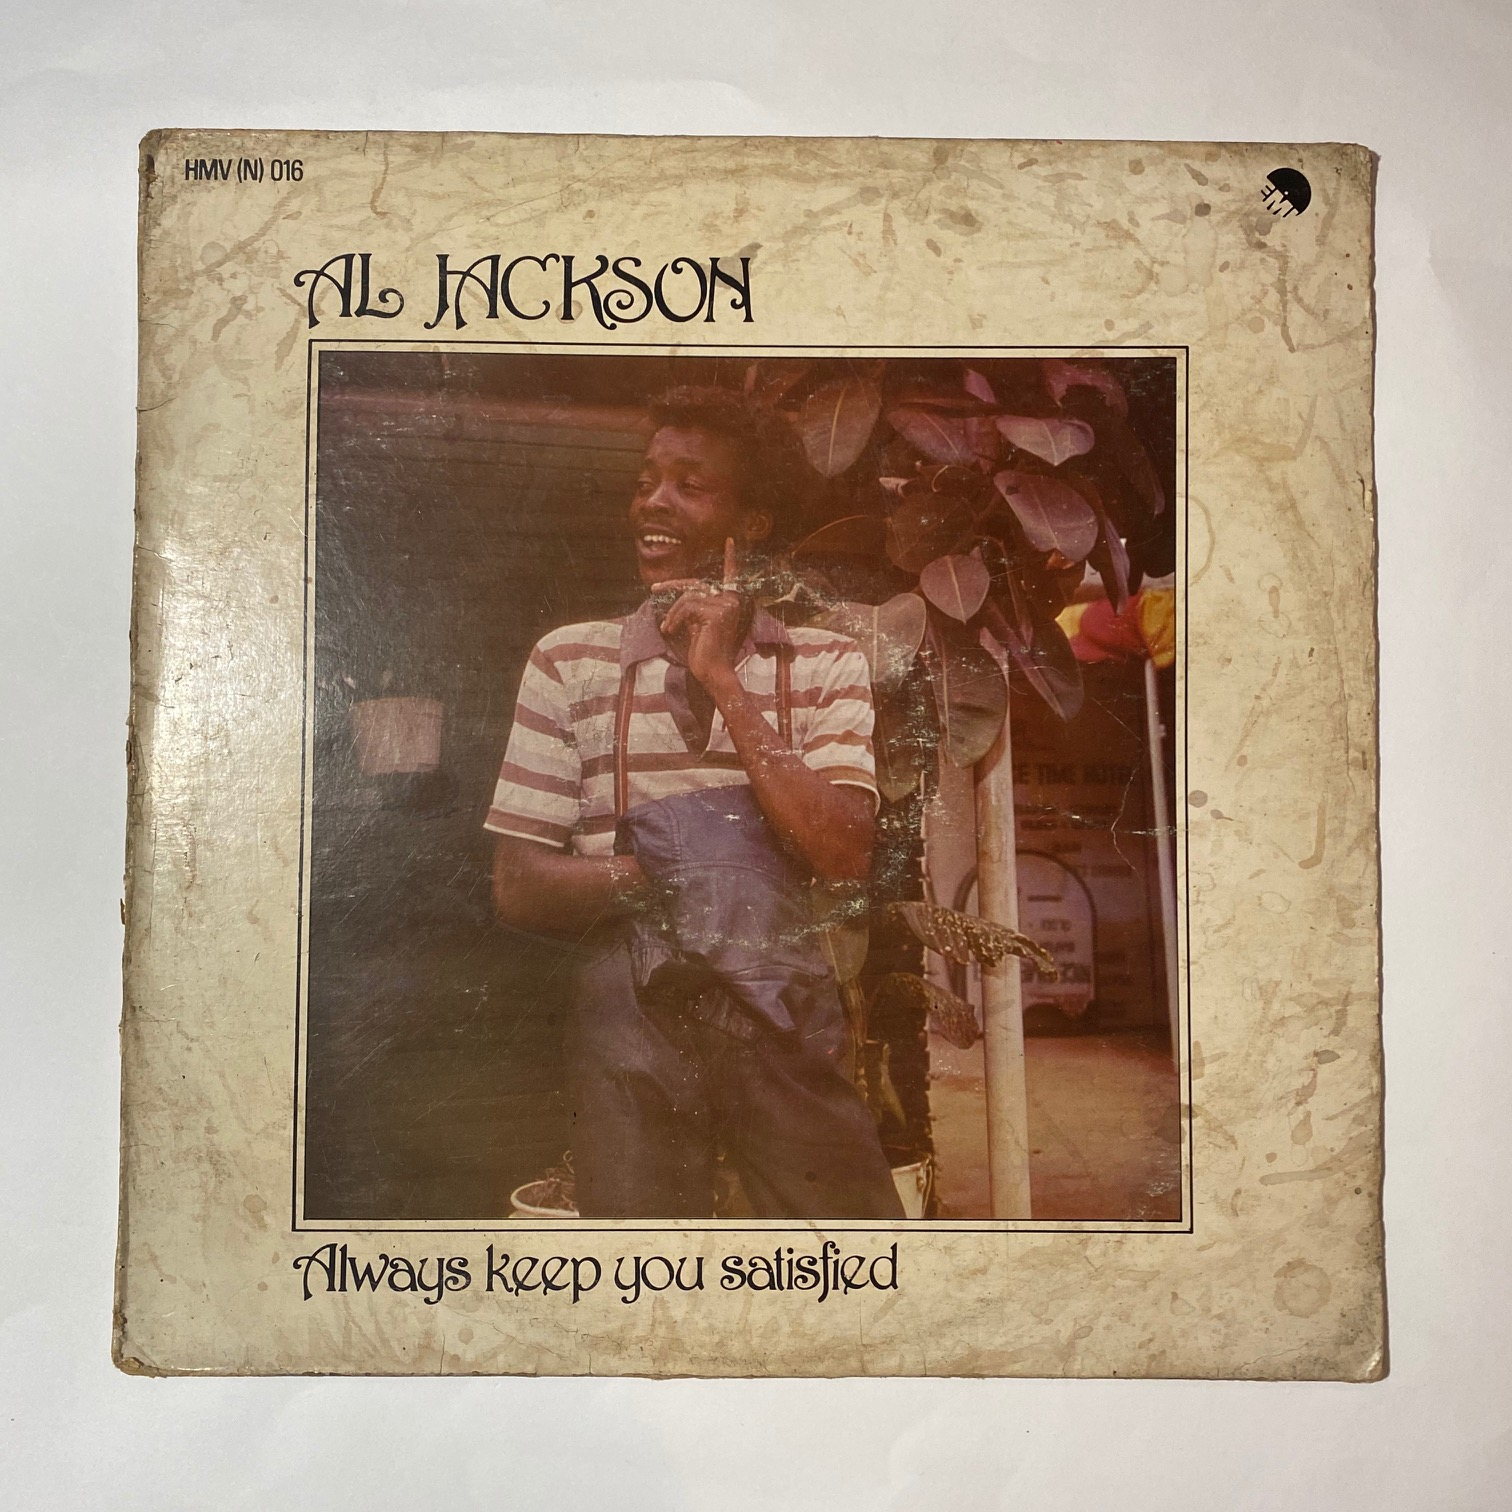 Al Jackson Always keep you satisfied